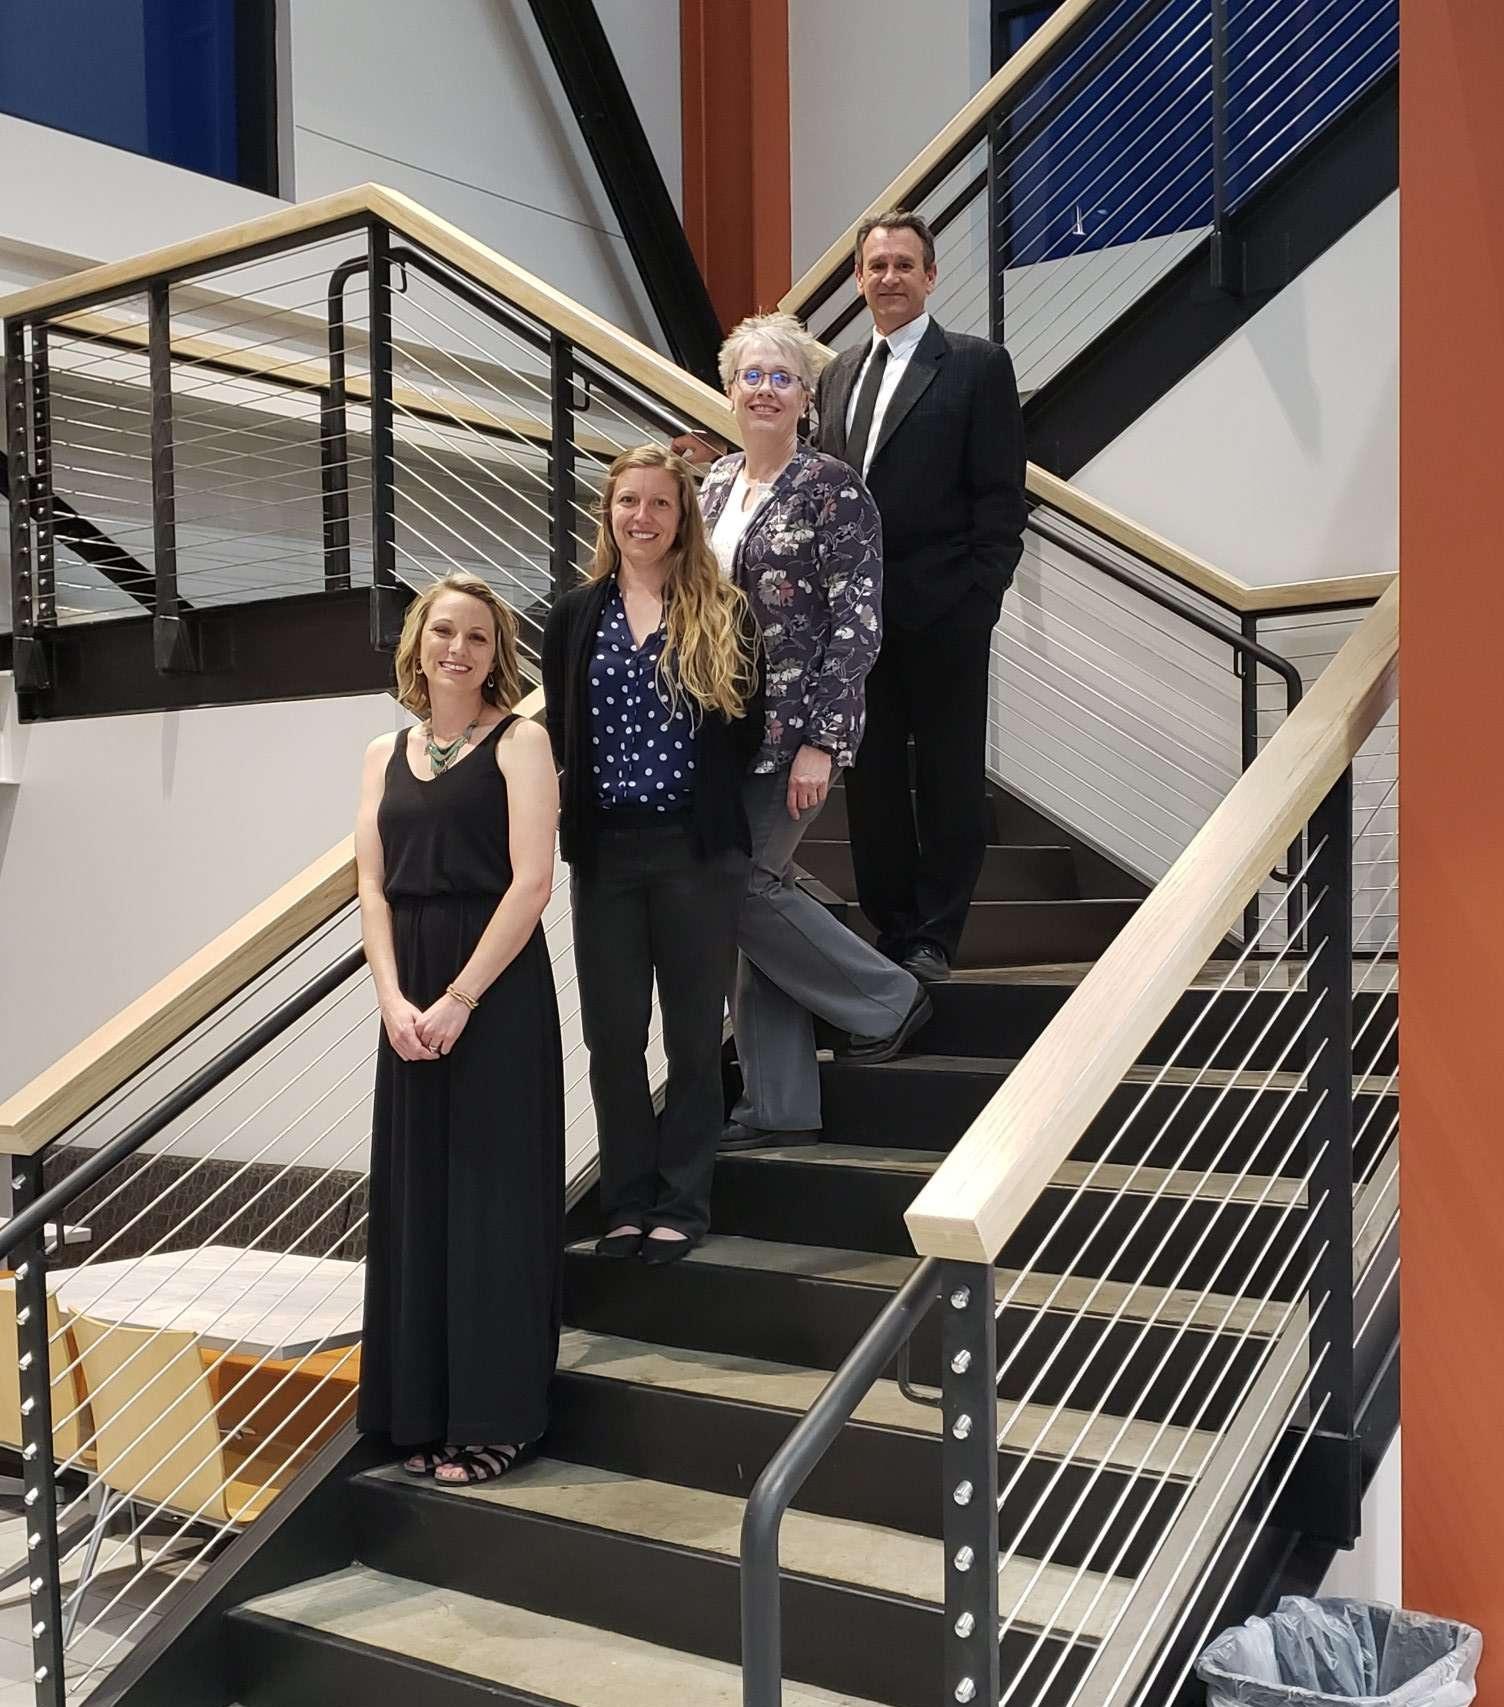 Cowley+College+Stair+Case_2019.jpg